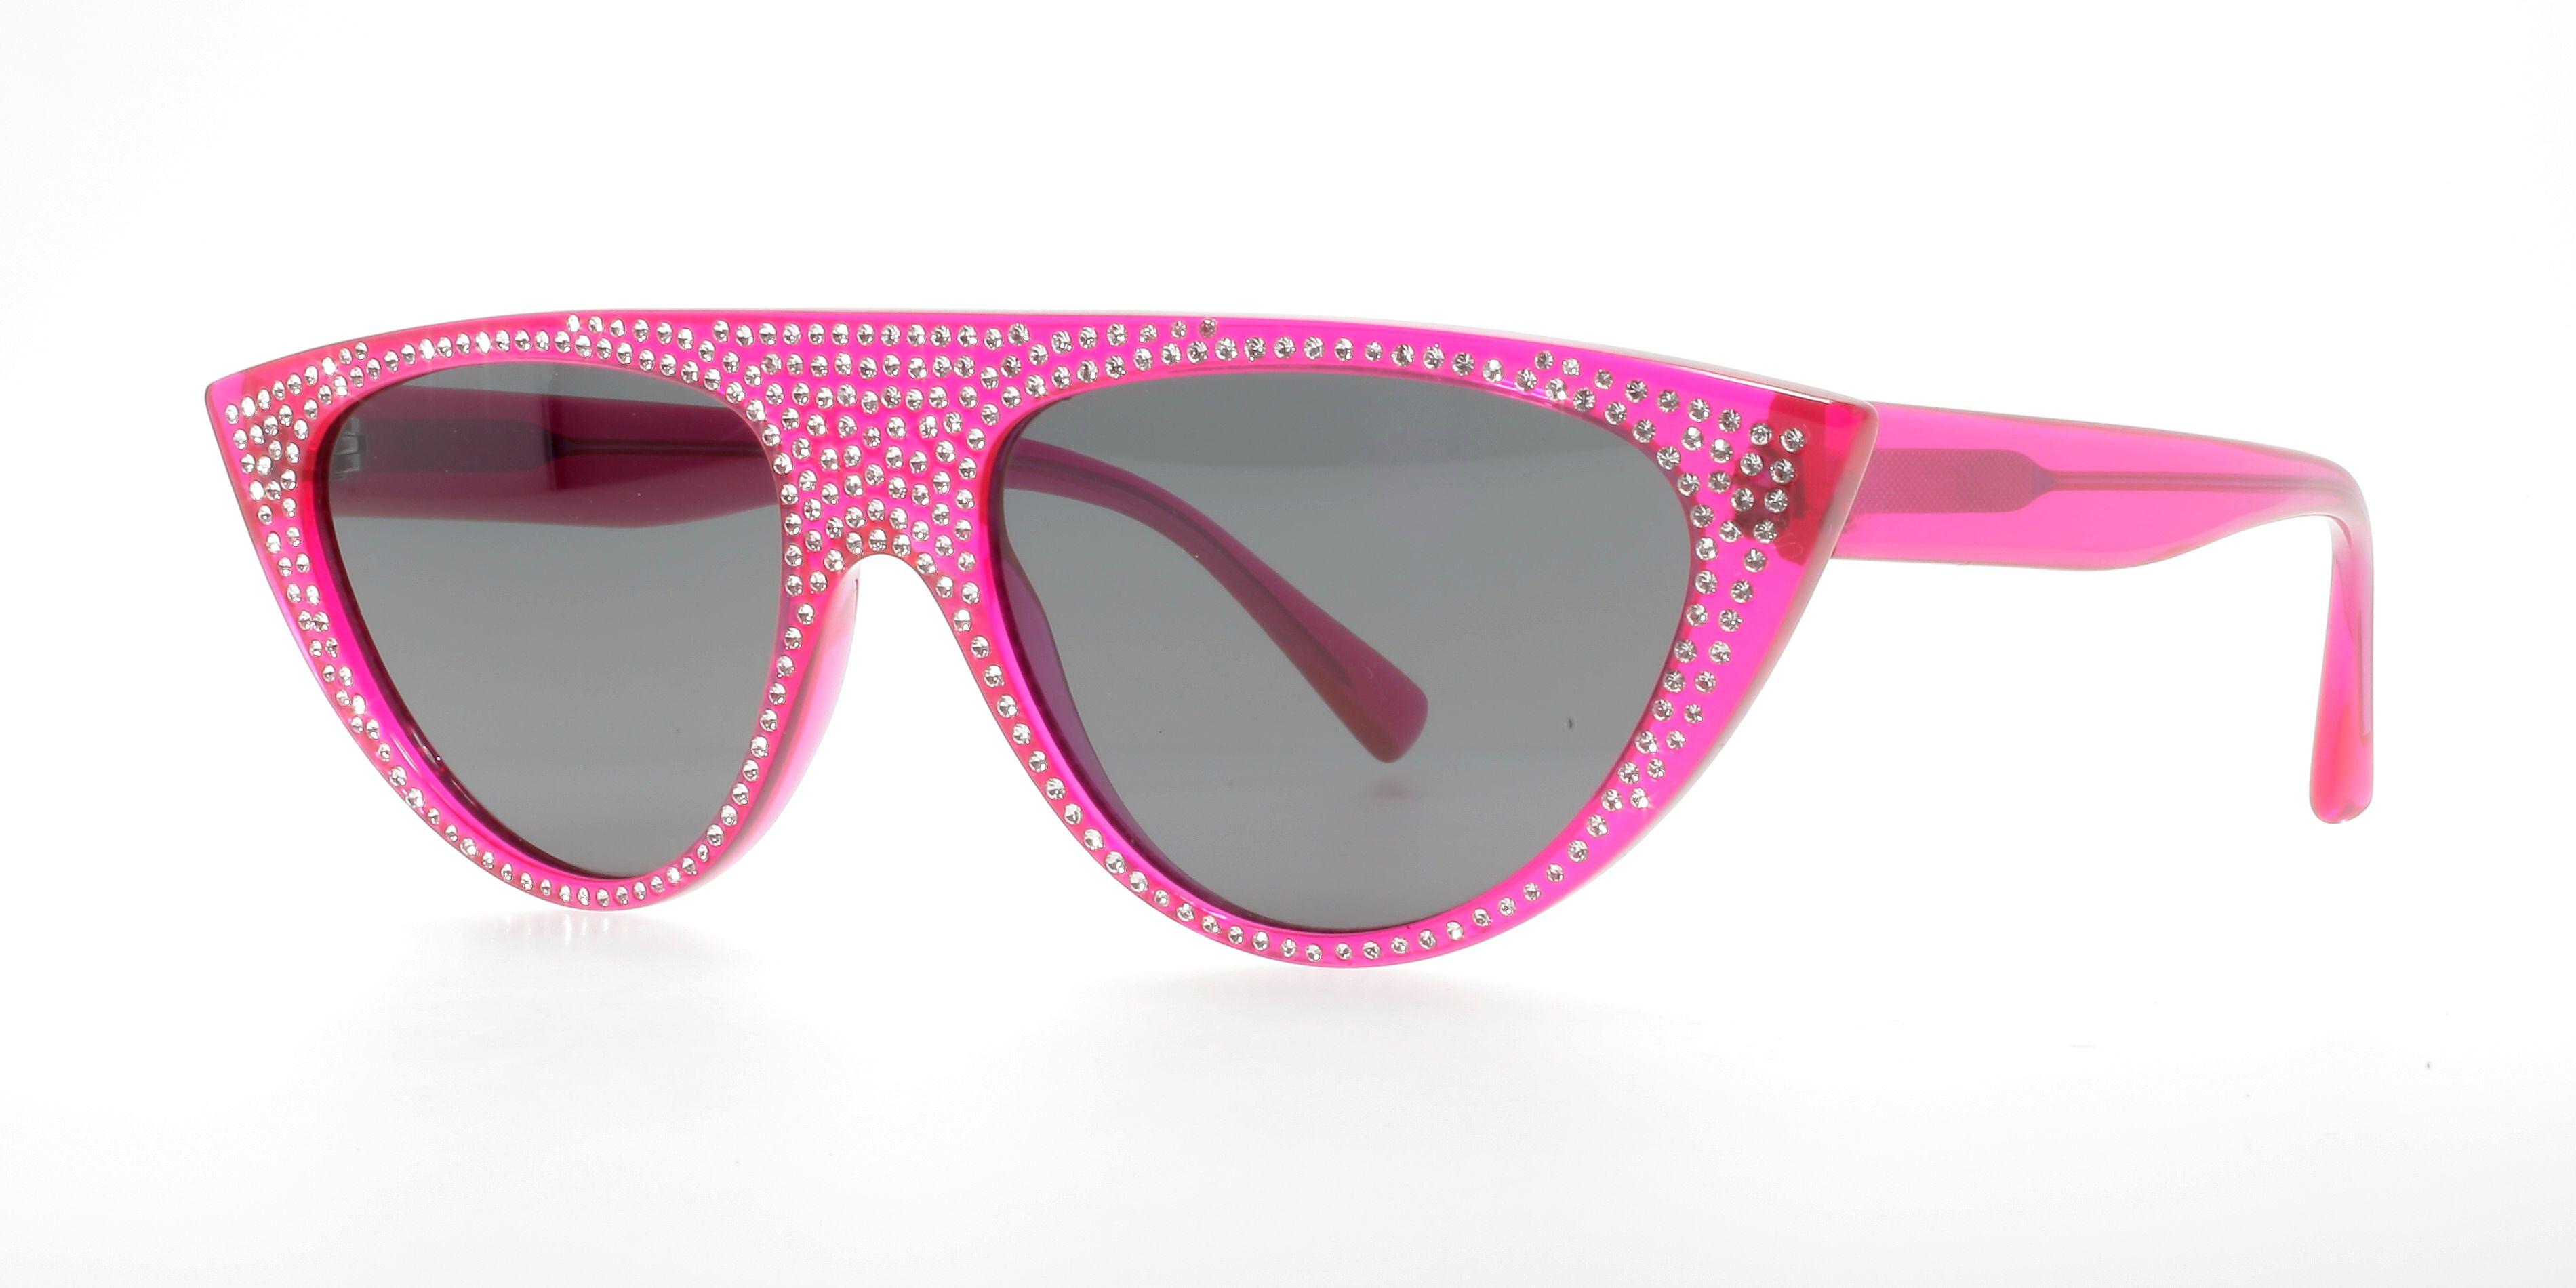 05f0263be9 Lightweight Polarized Sunglasses Alain Mikli Designer Glasses Source · ALAIN  MIKLI x JEREMY SCOTT MAXIMAL EYEGLASSES A Part Magazine